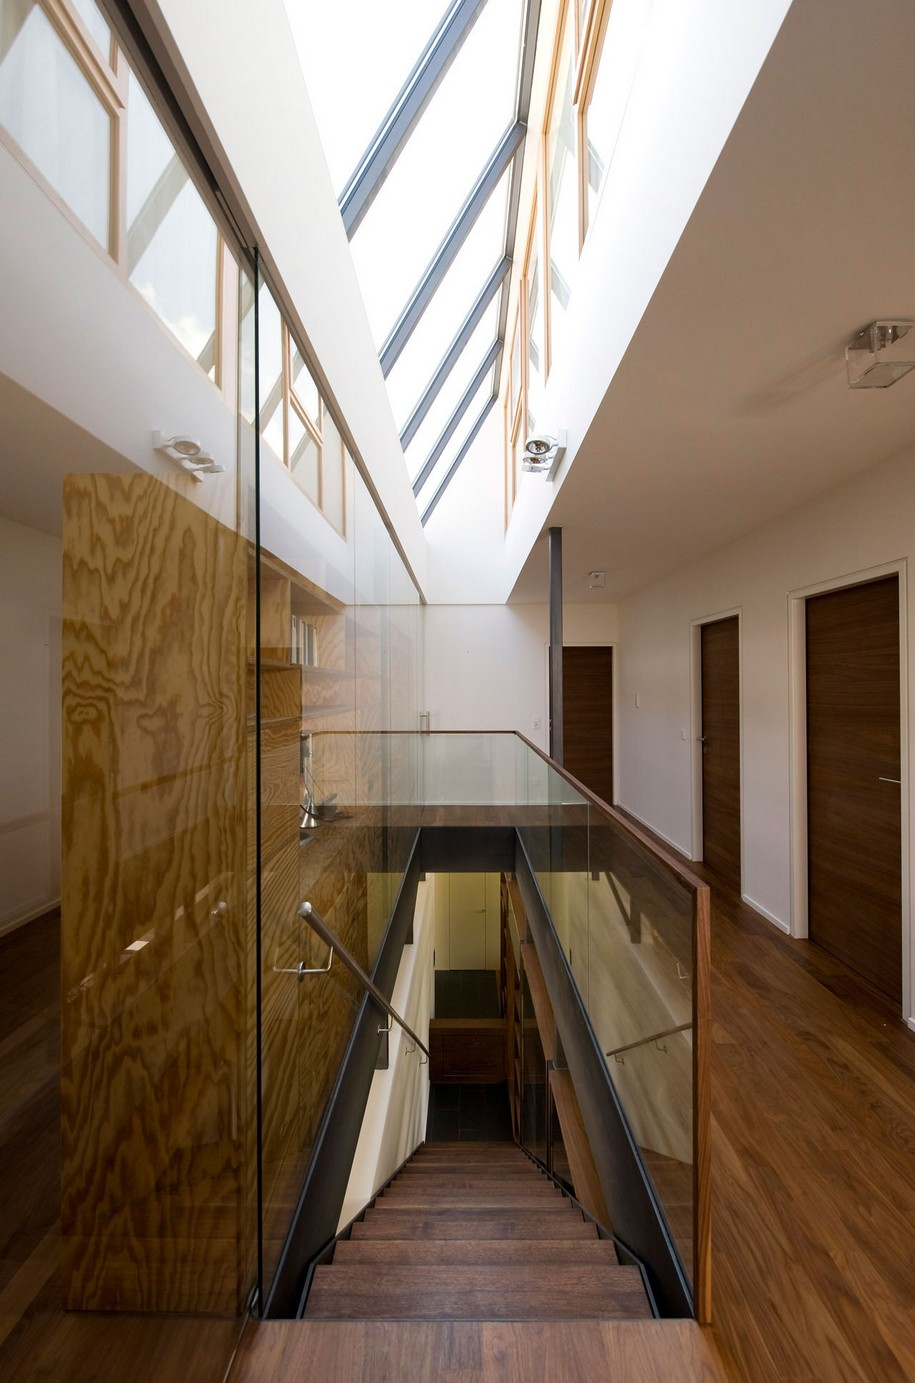 Экологически-чистый Kiko House В Австрии